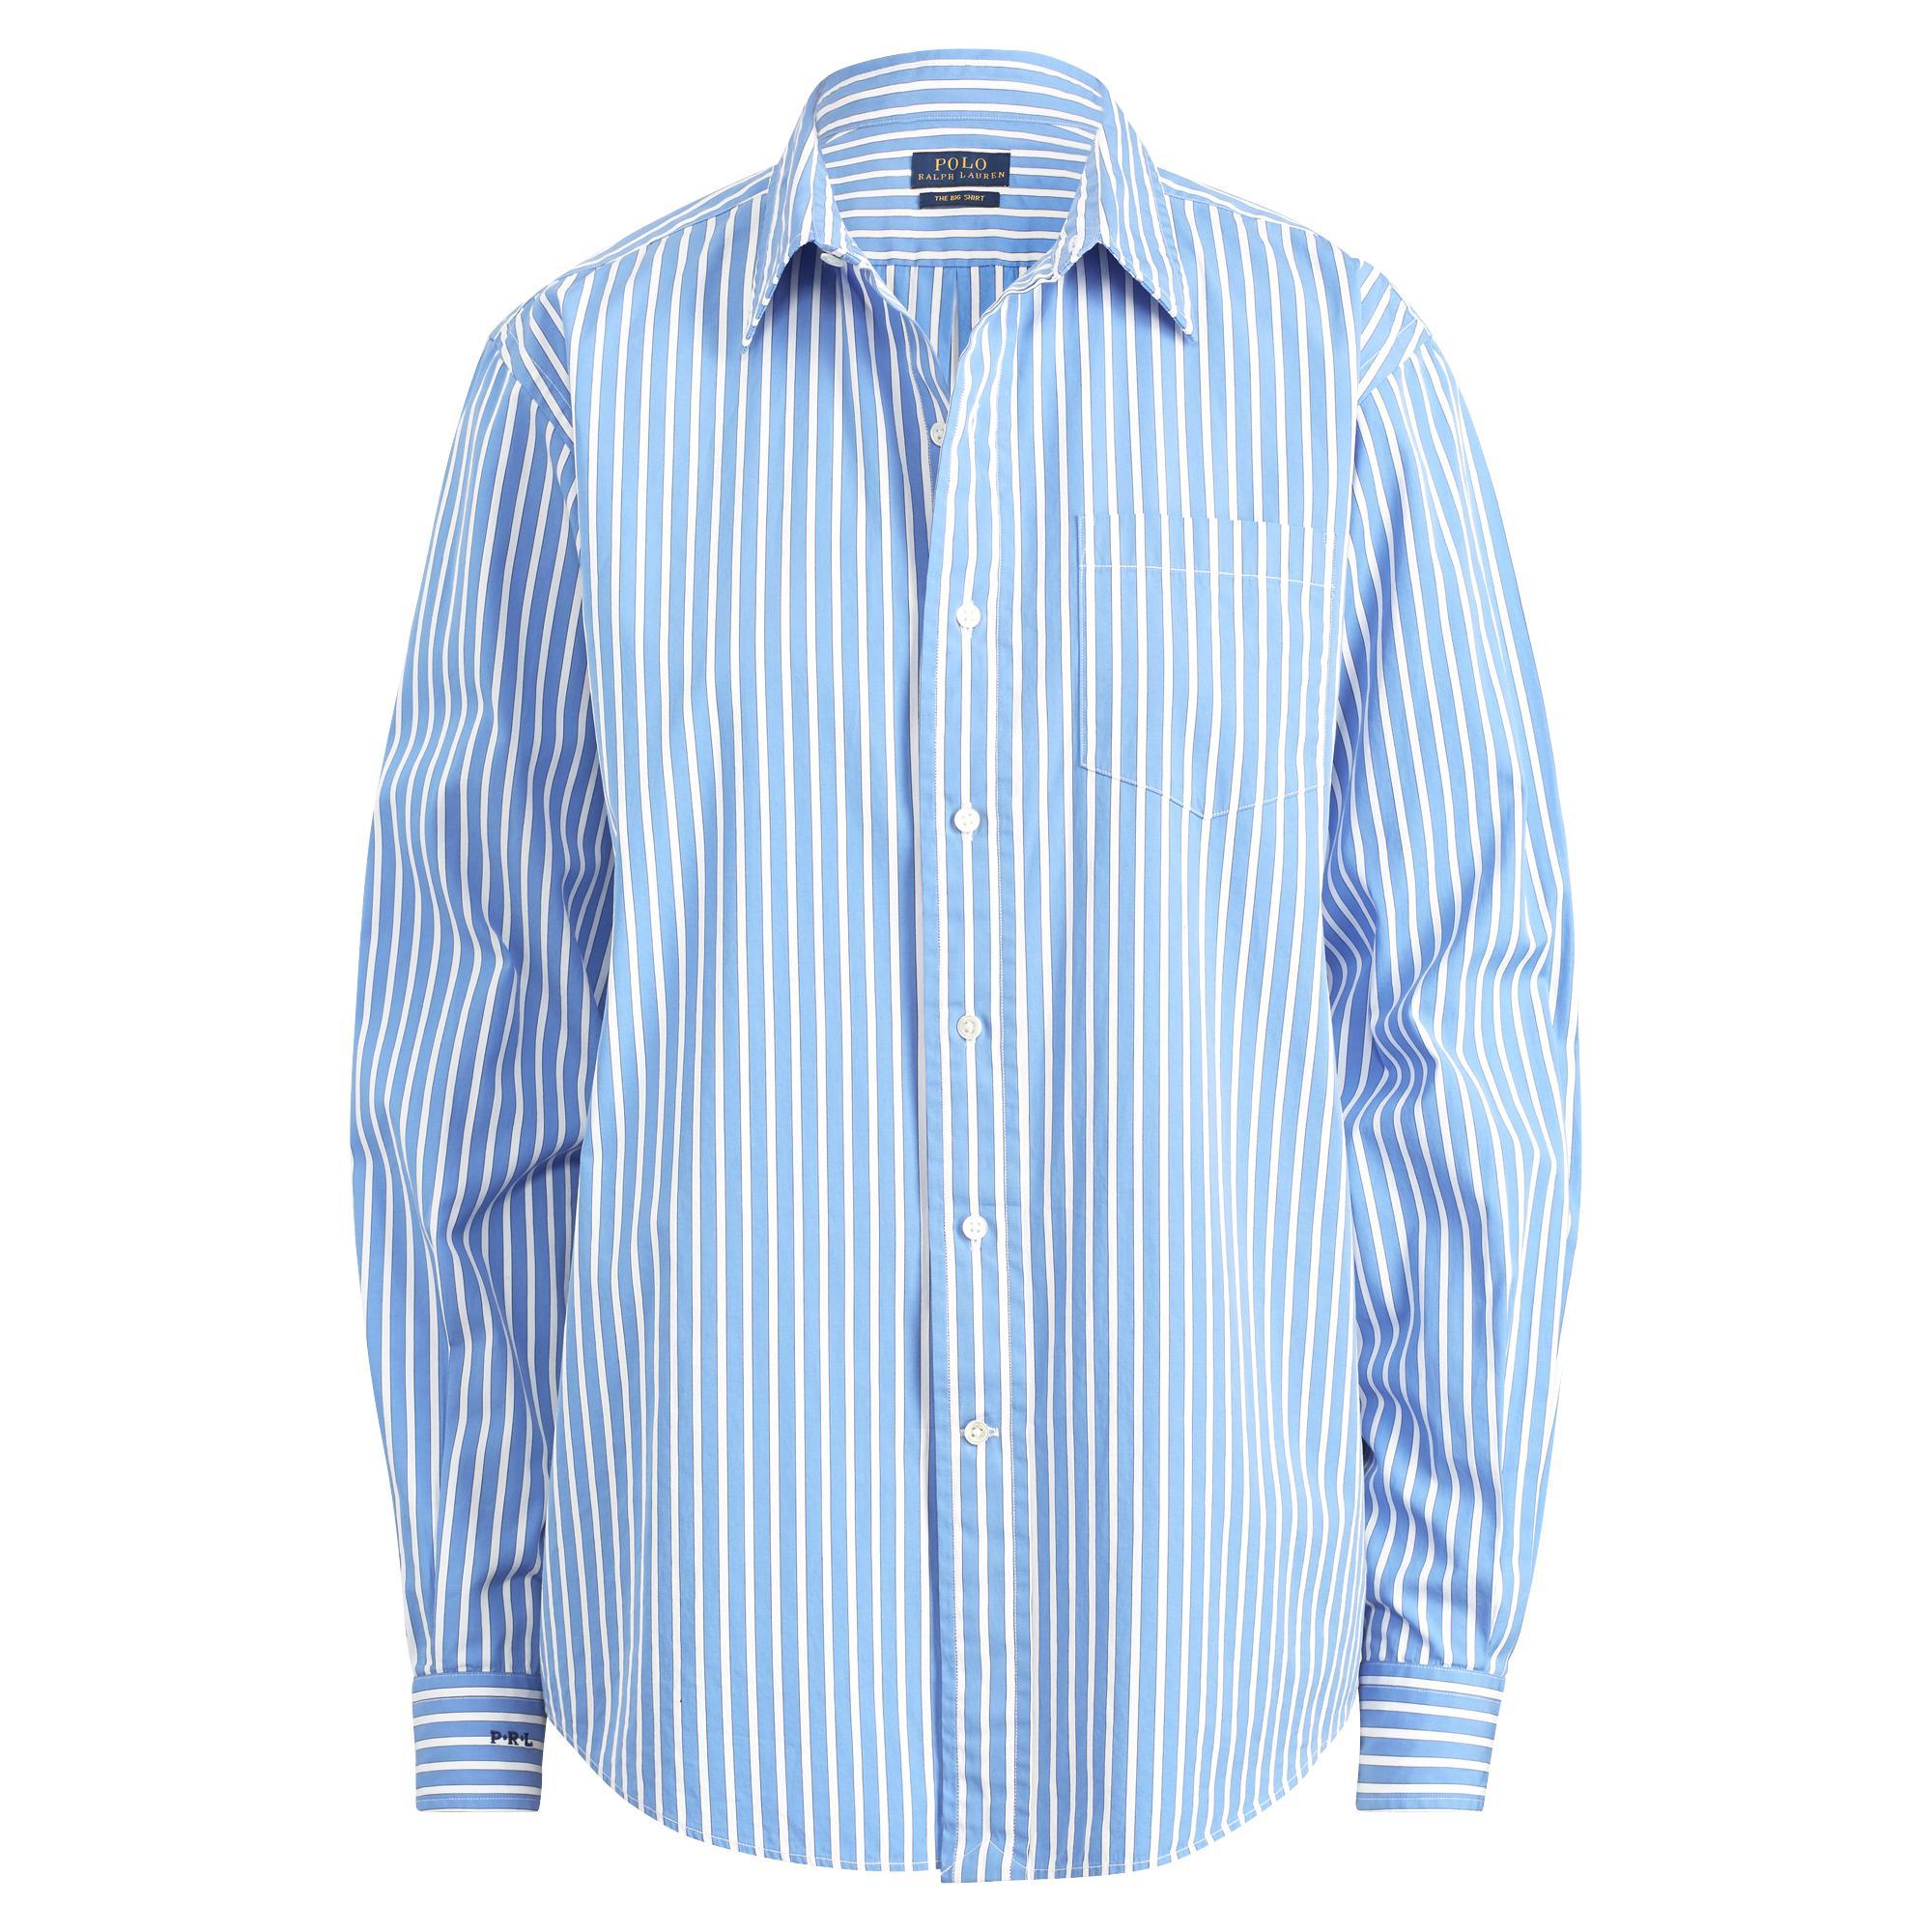 5f0db94e6 Polo Ralph Lauren Big Fit Striped Cotton Shirt in Blue - Lyst